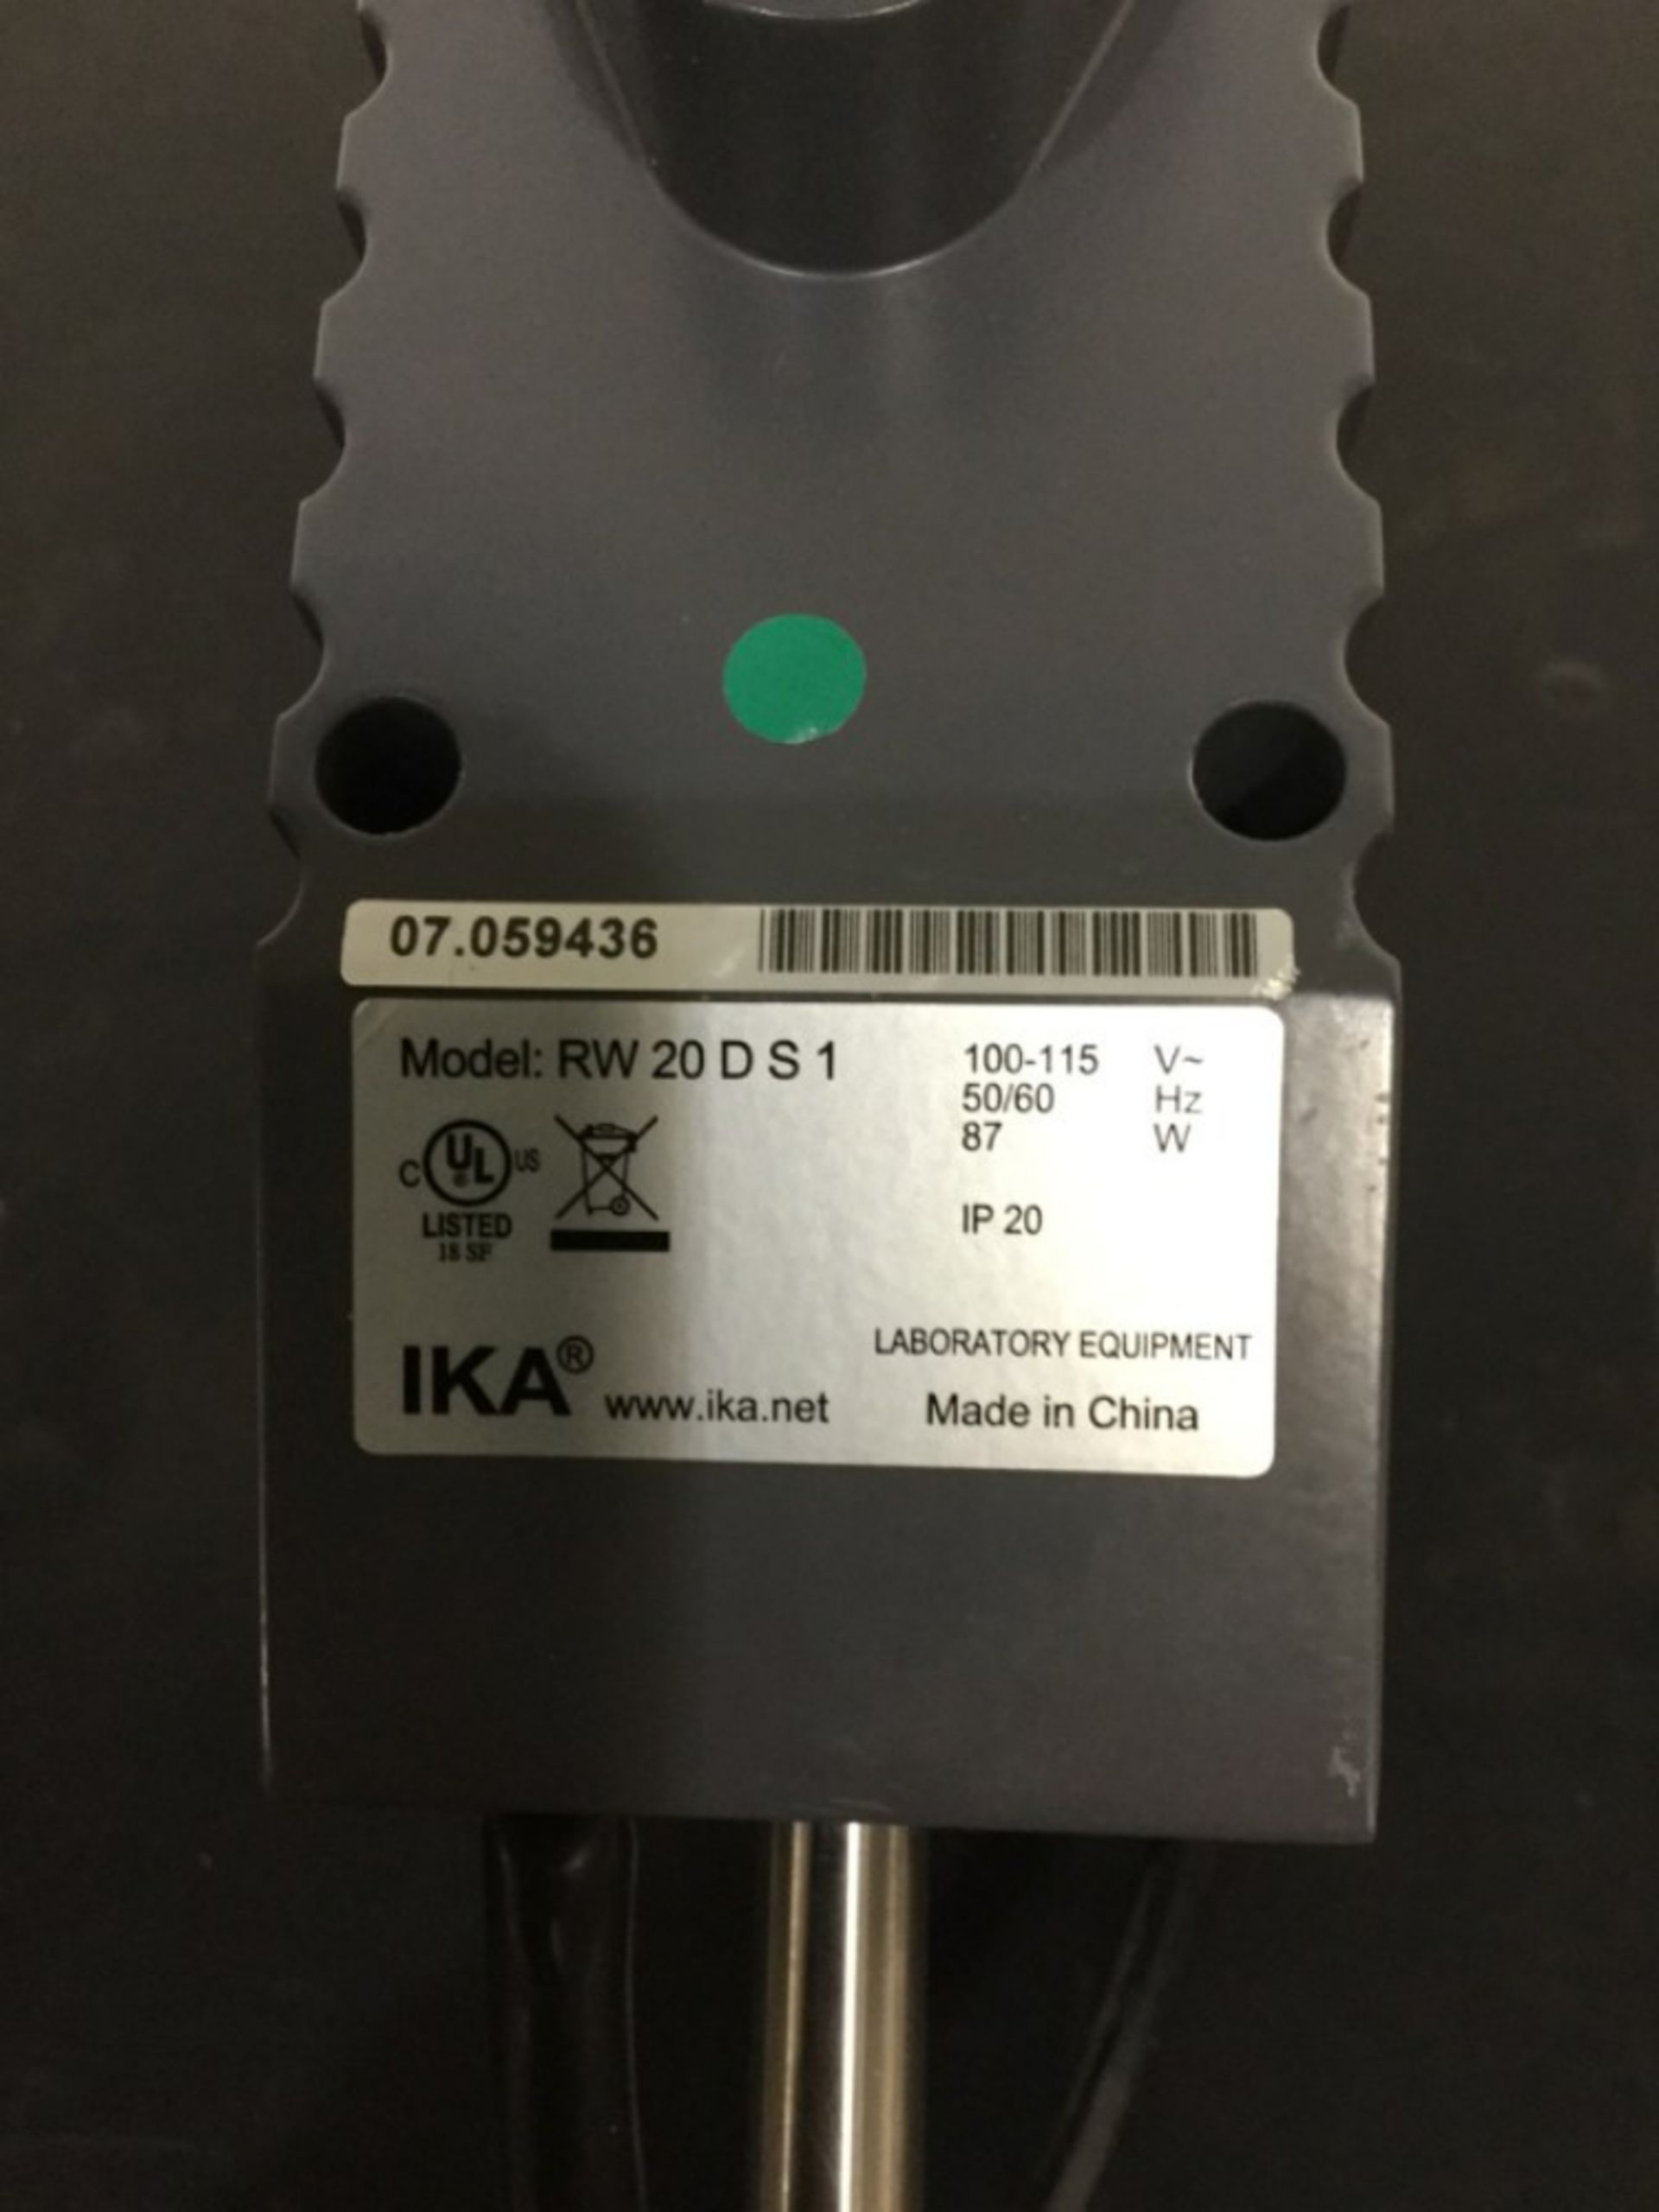 Lot 58 - Ika RV 20 Digital Overhead Mixer